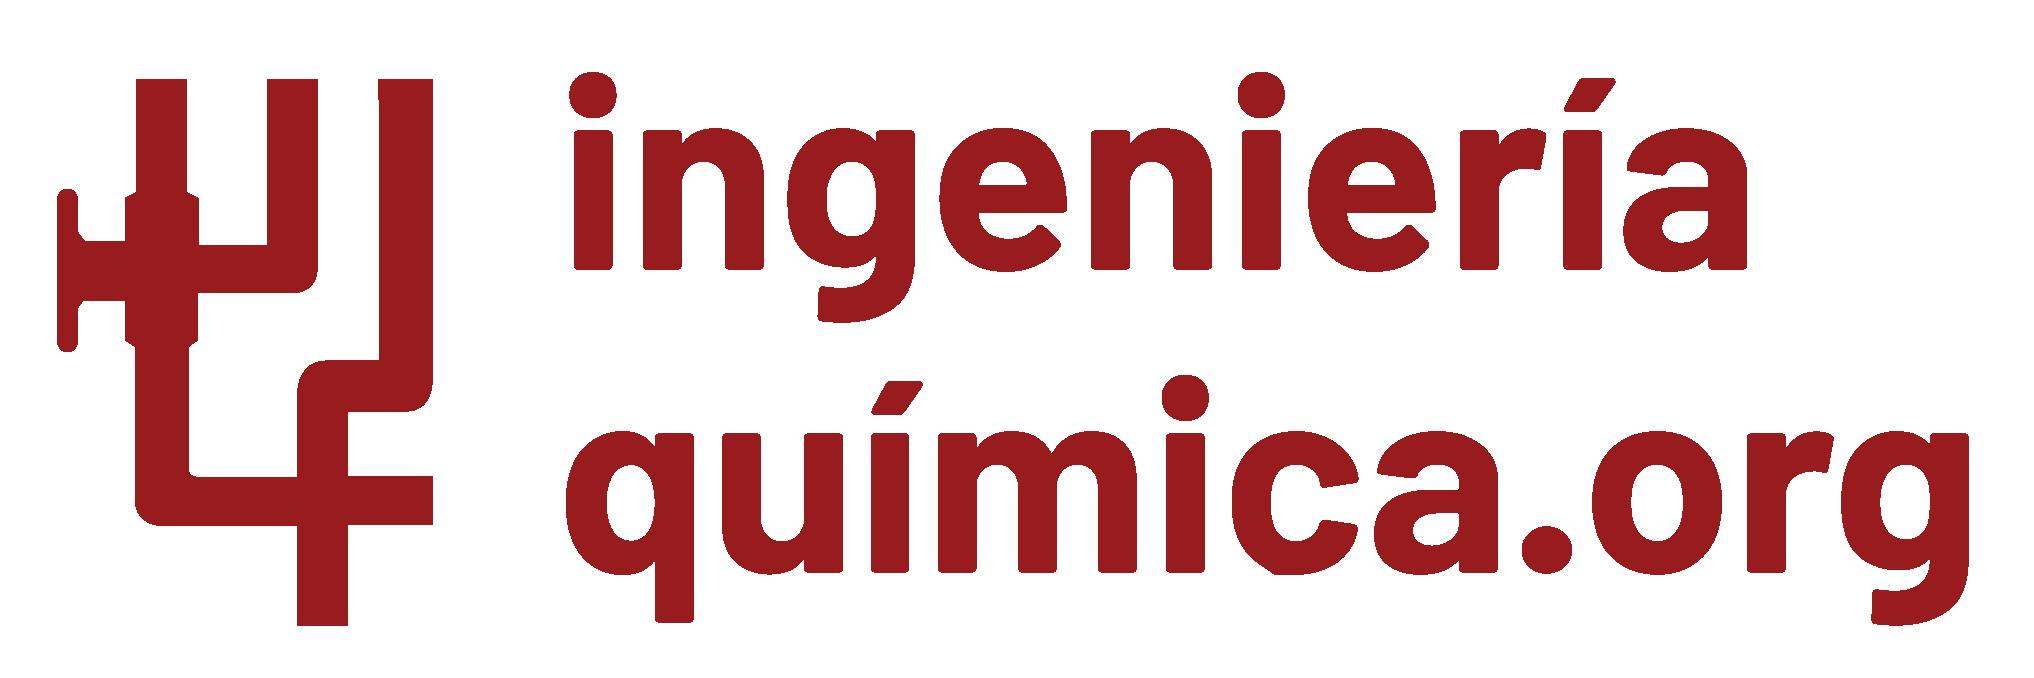 Cómo armar un Currículum Vitae? | IngenieriaQuimica.org